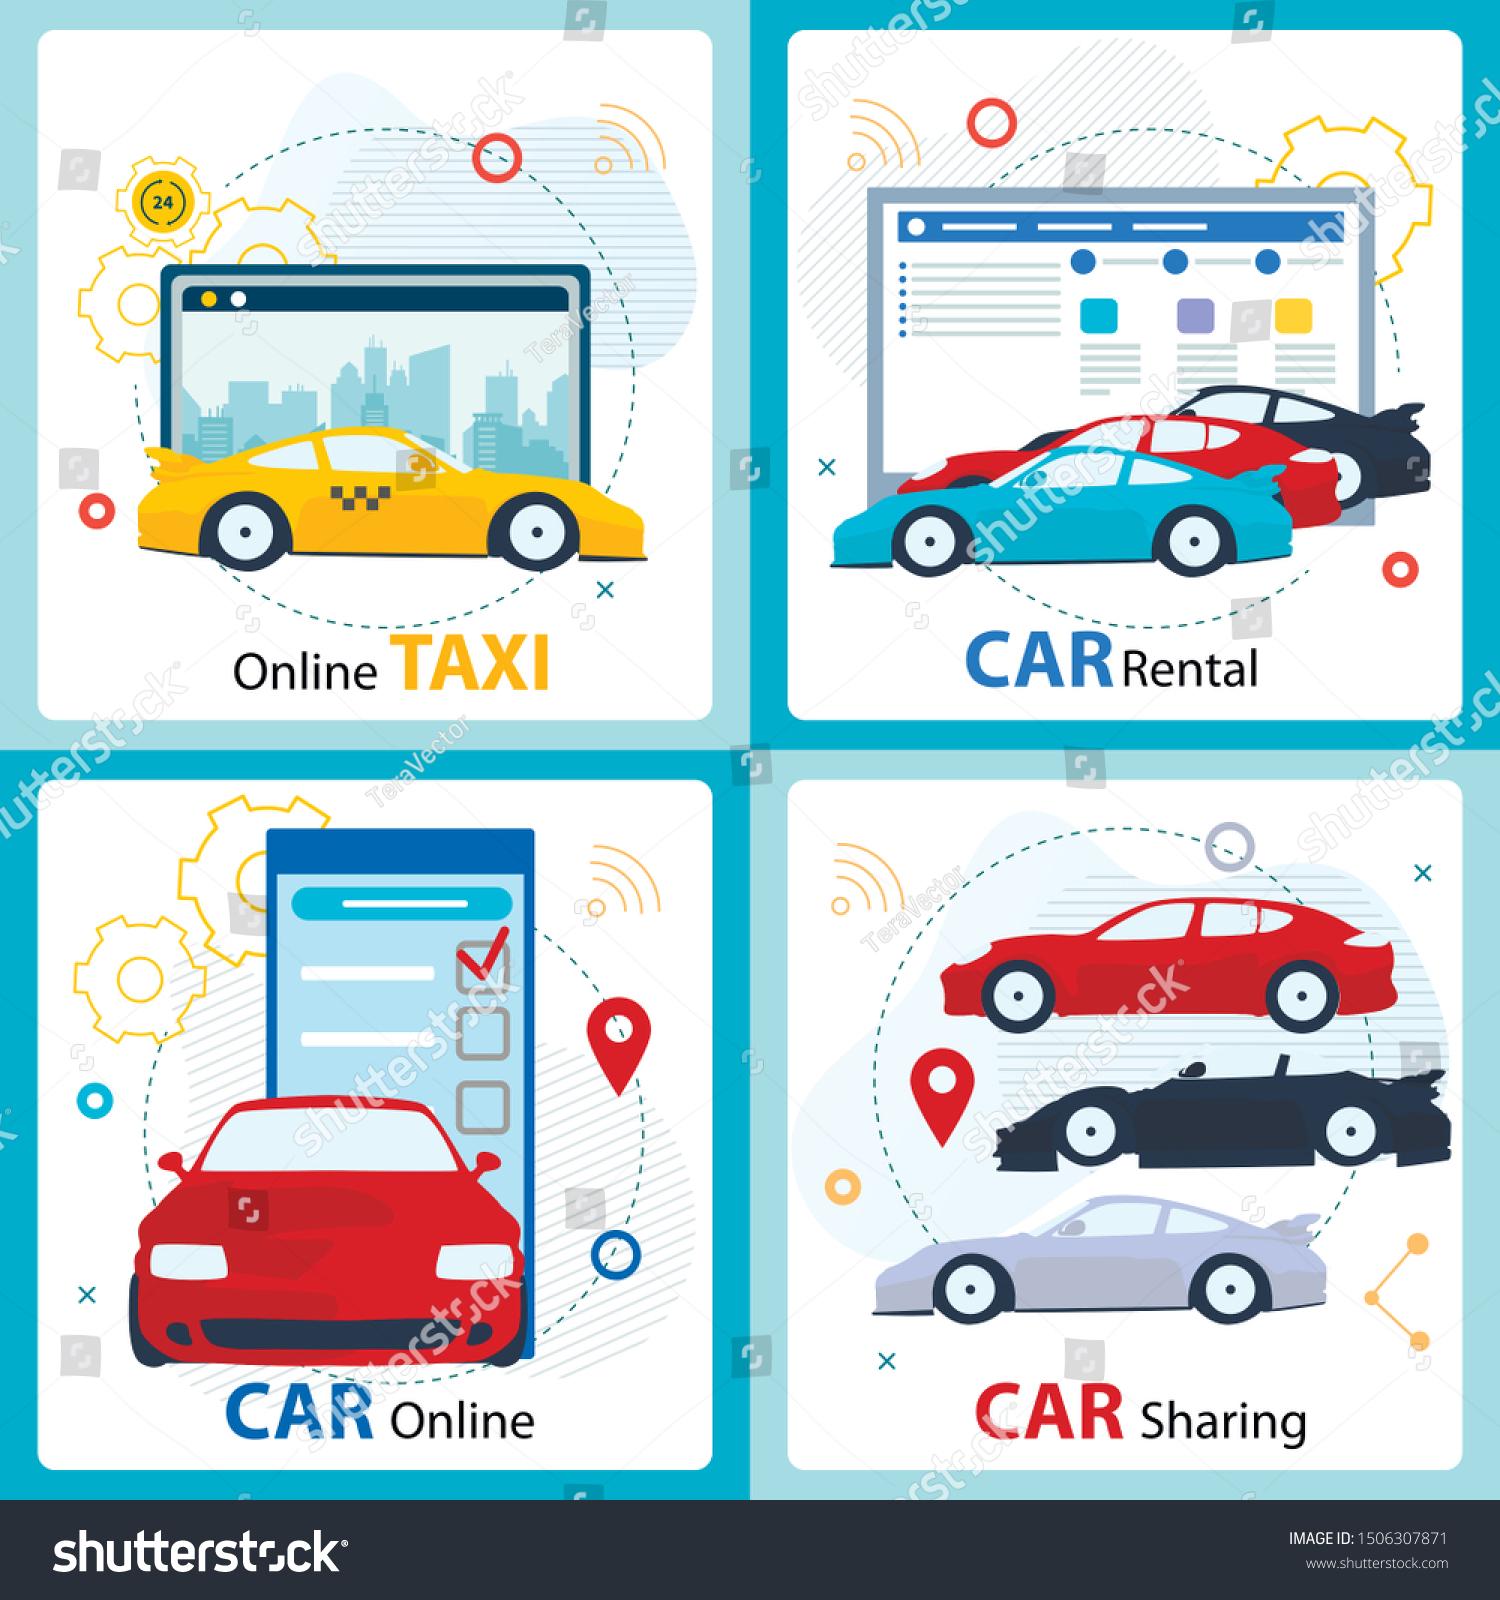 Car Sharing Rental Service Advertising Cartoon Stock Vector Royalty Free 1506307871